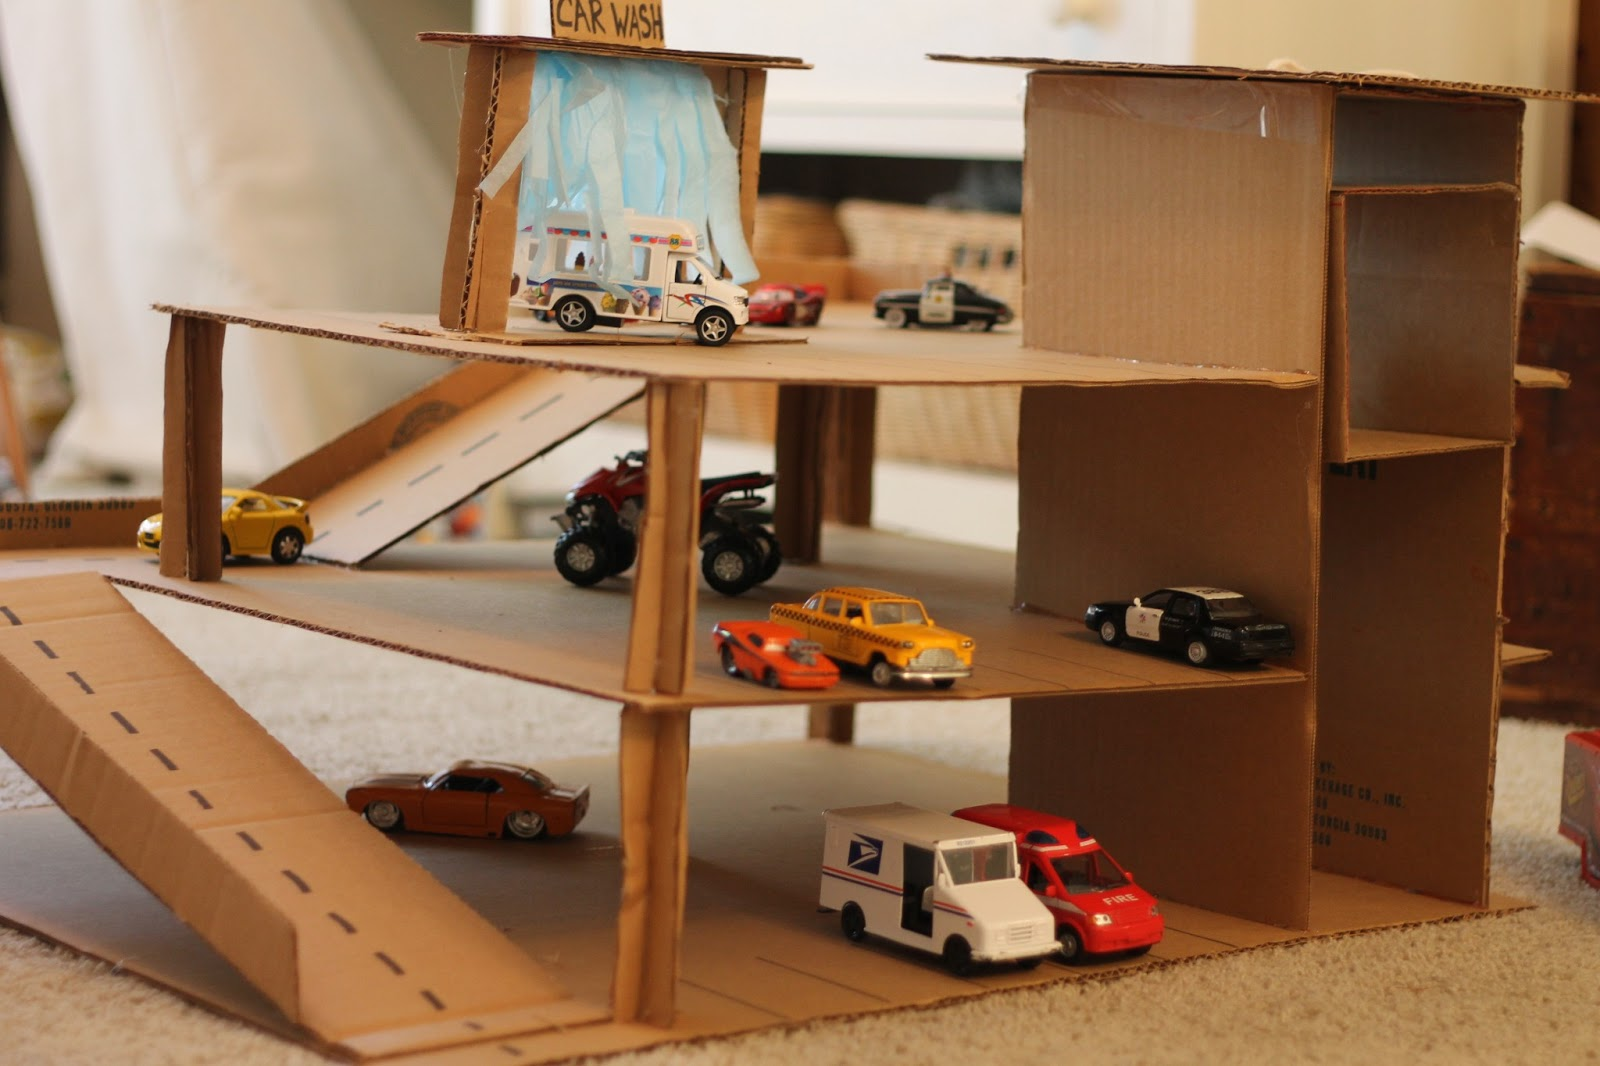 All Things Reintjes A Little Cardboard Constructing